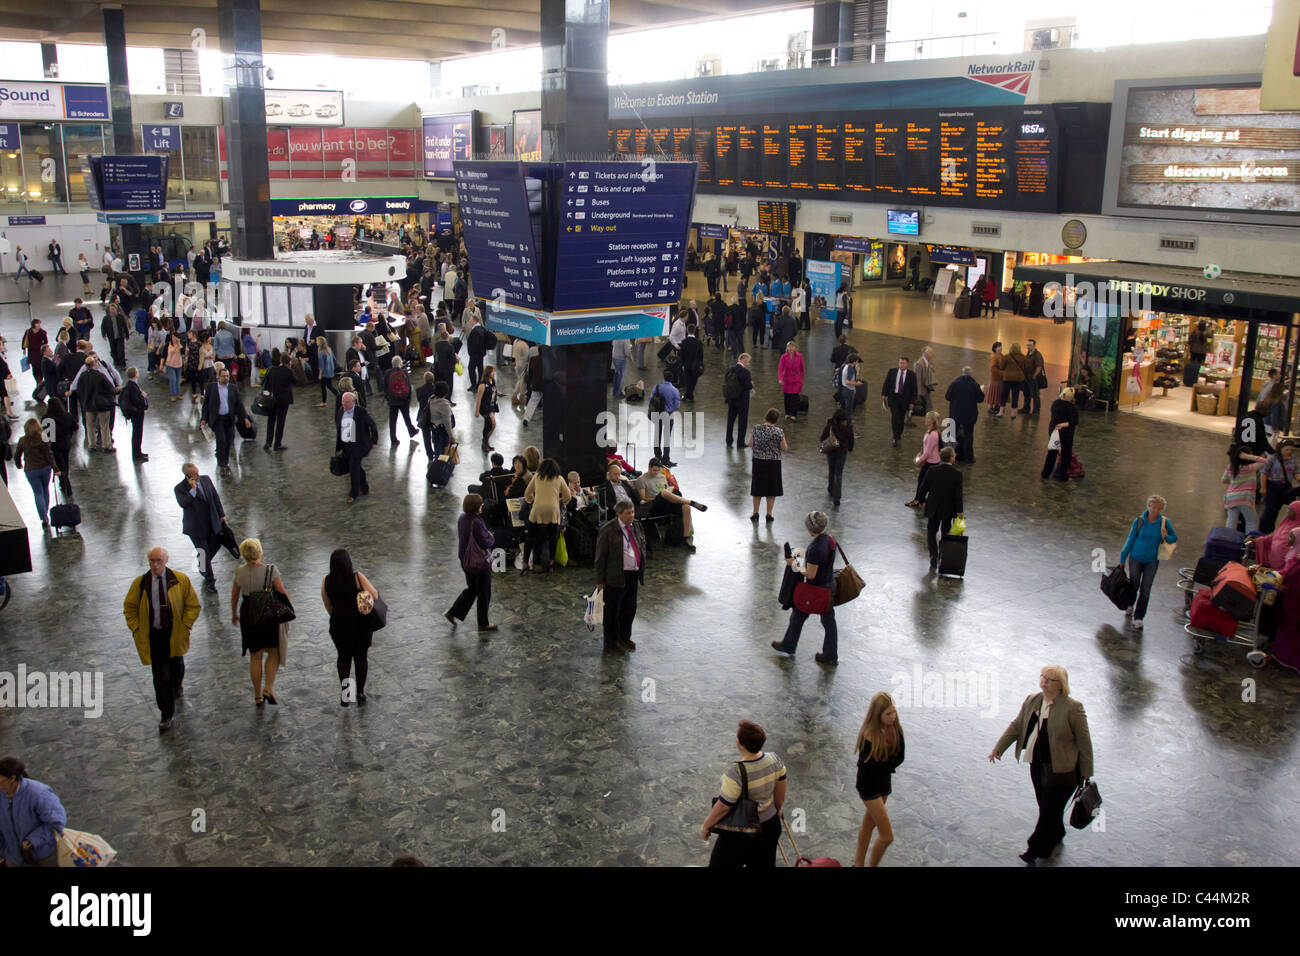 Concourse - Euston Mainline Railway Station - London - Stock Image